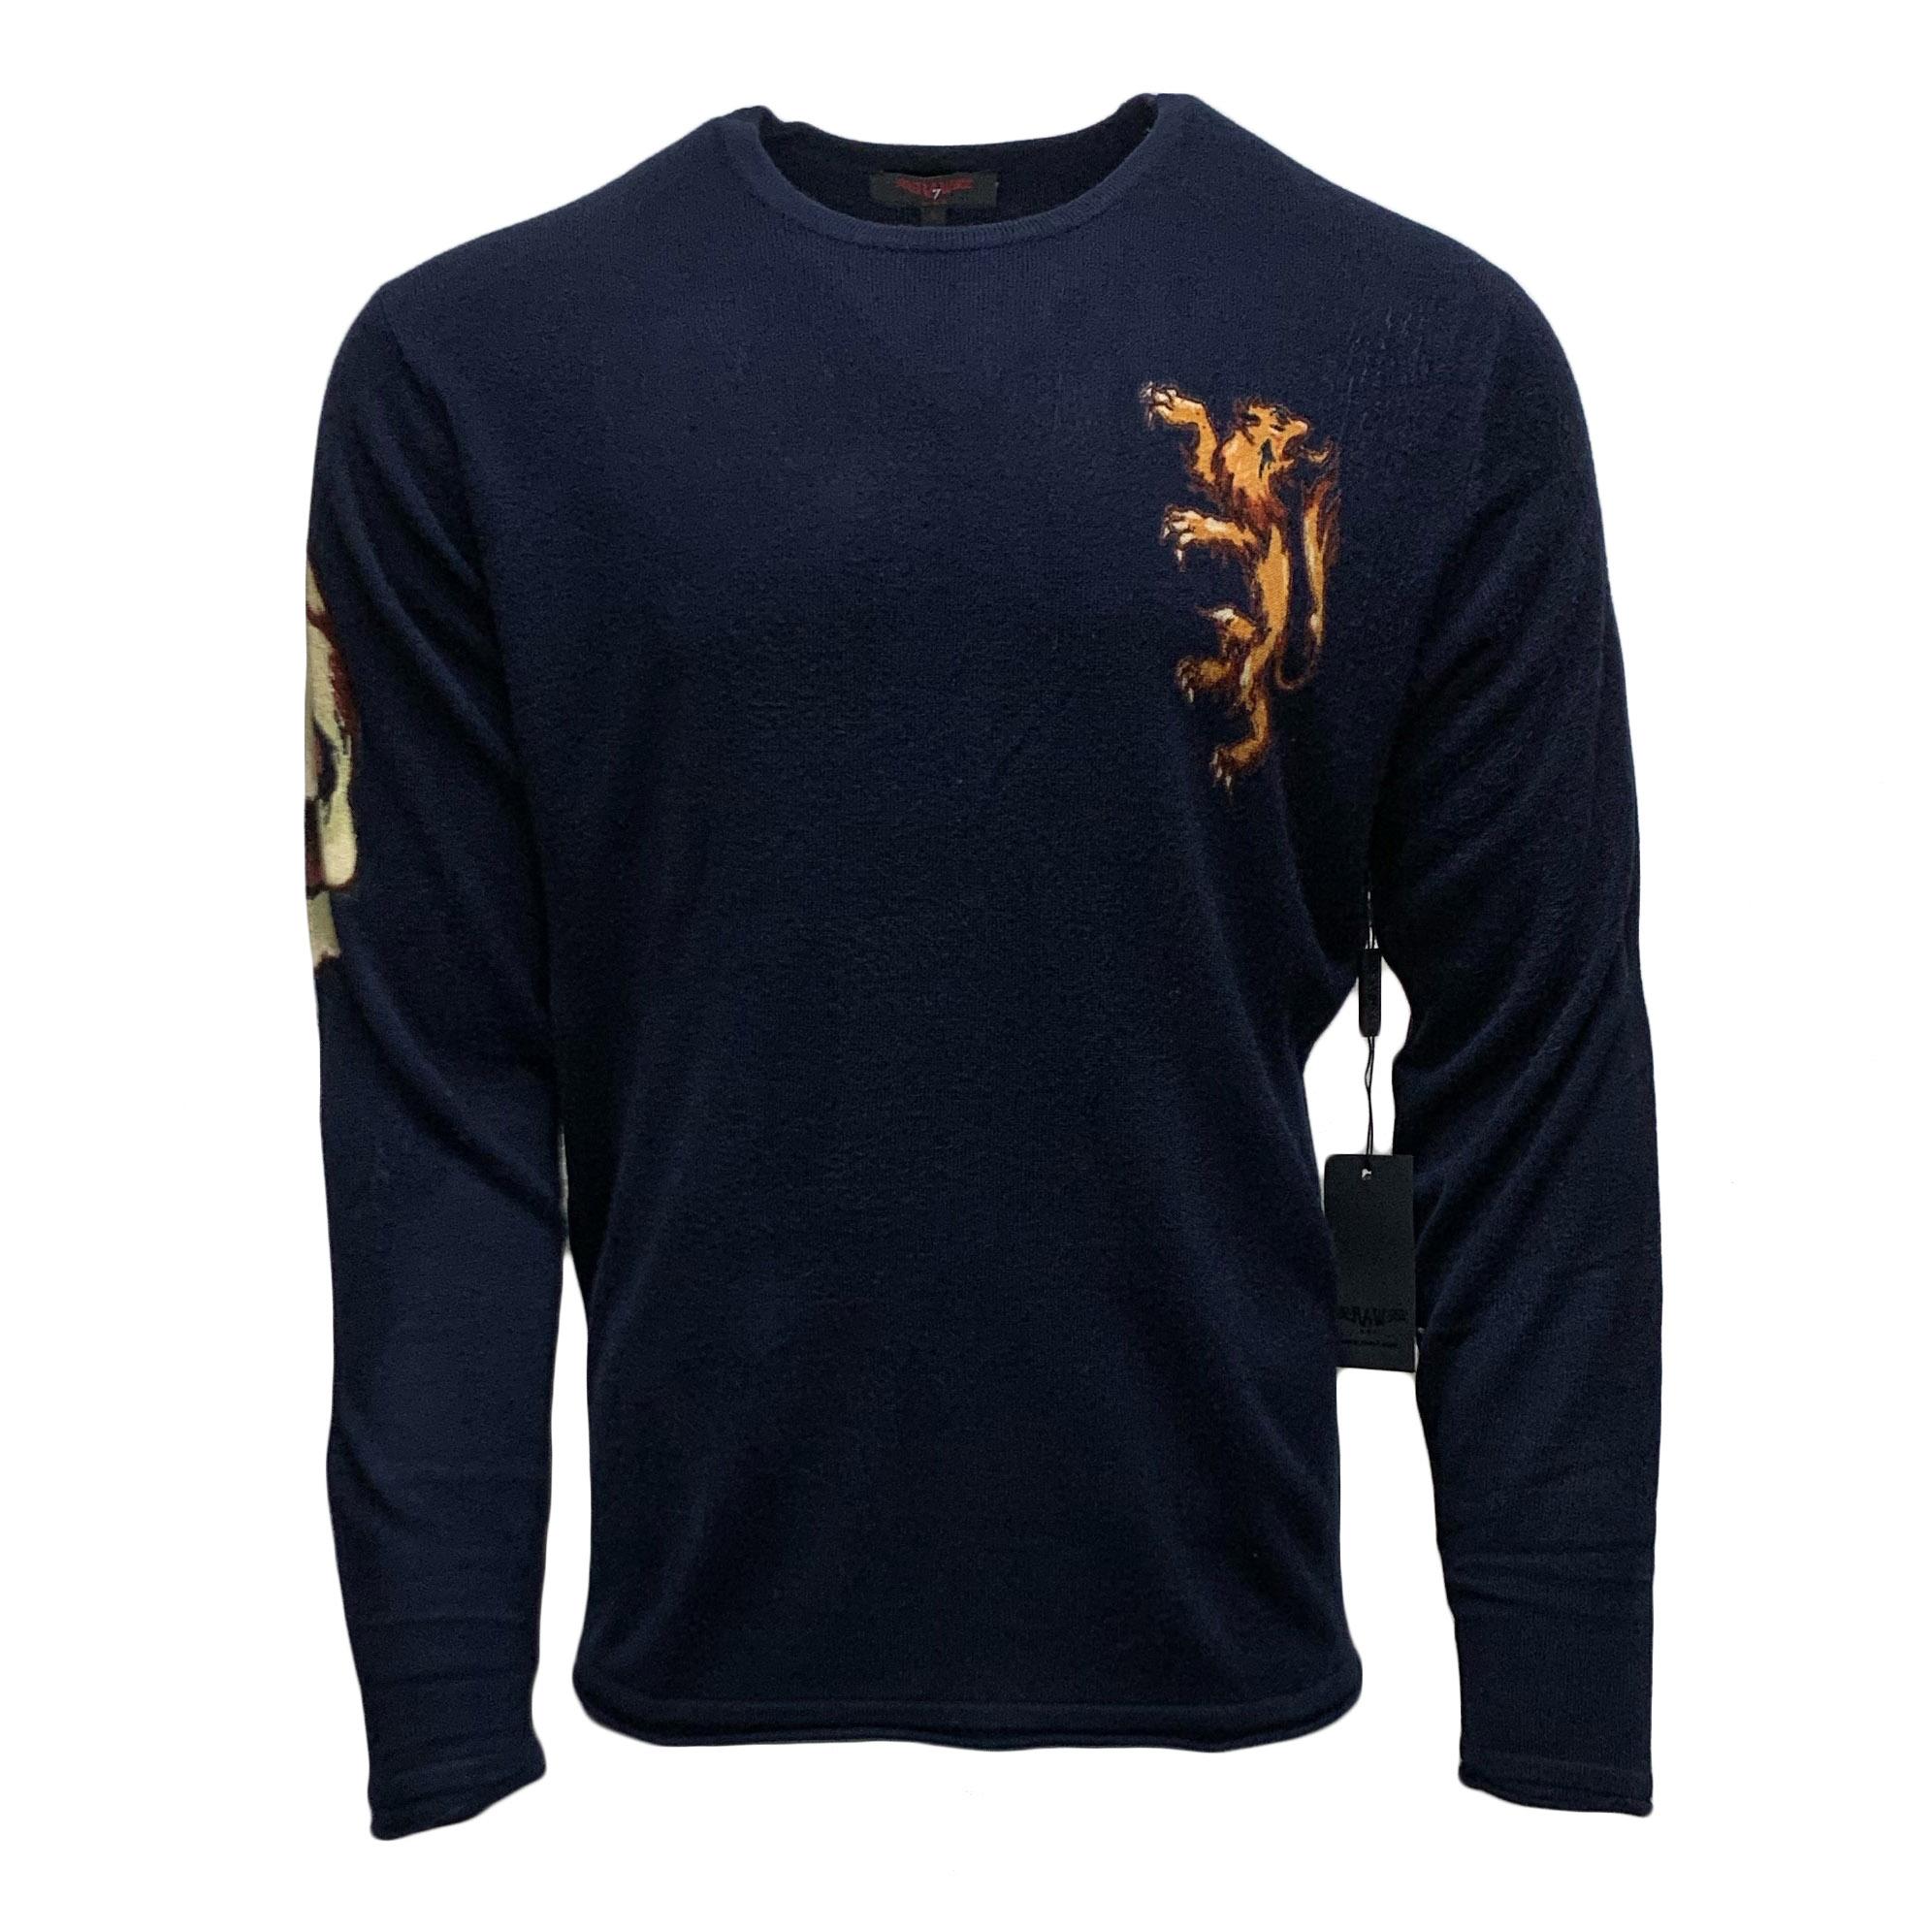 RAW-7 G09H03-EAGLE-LION RAW7 Men's 100% Acrylic Crewneck Sweater Eagle Lion Design - Navy